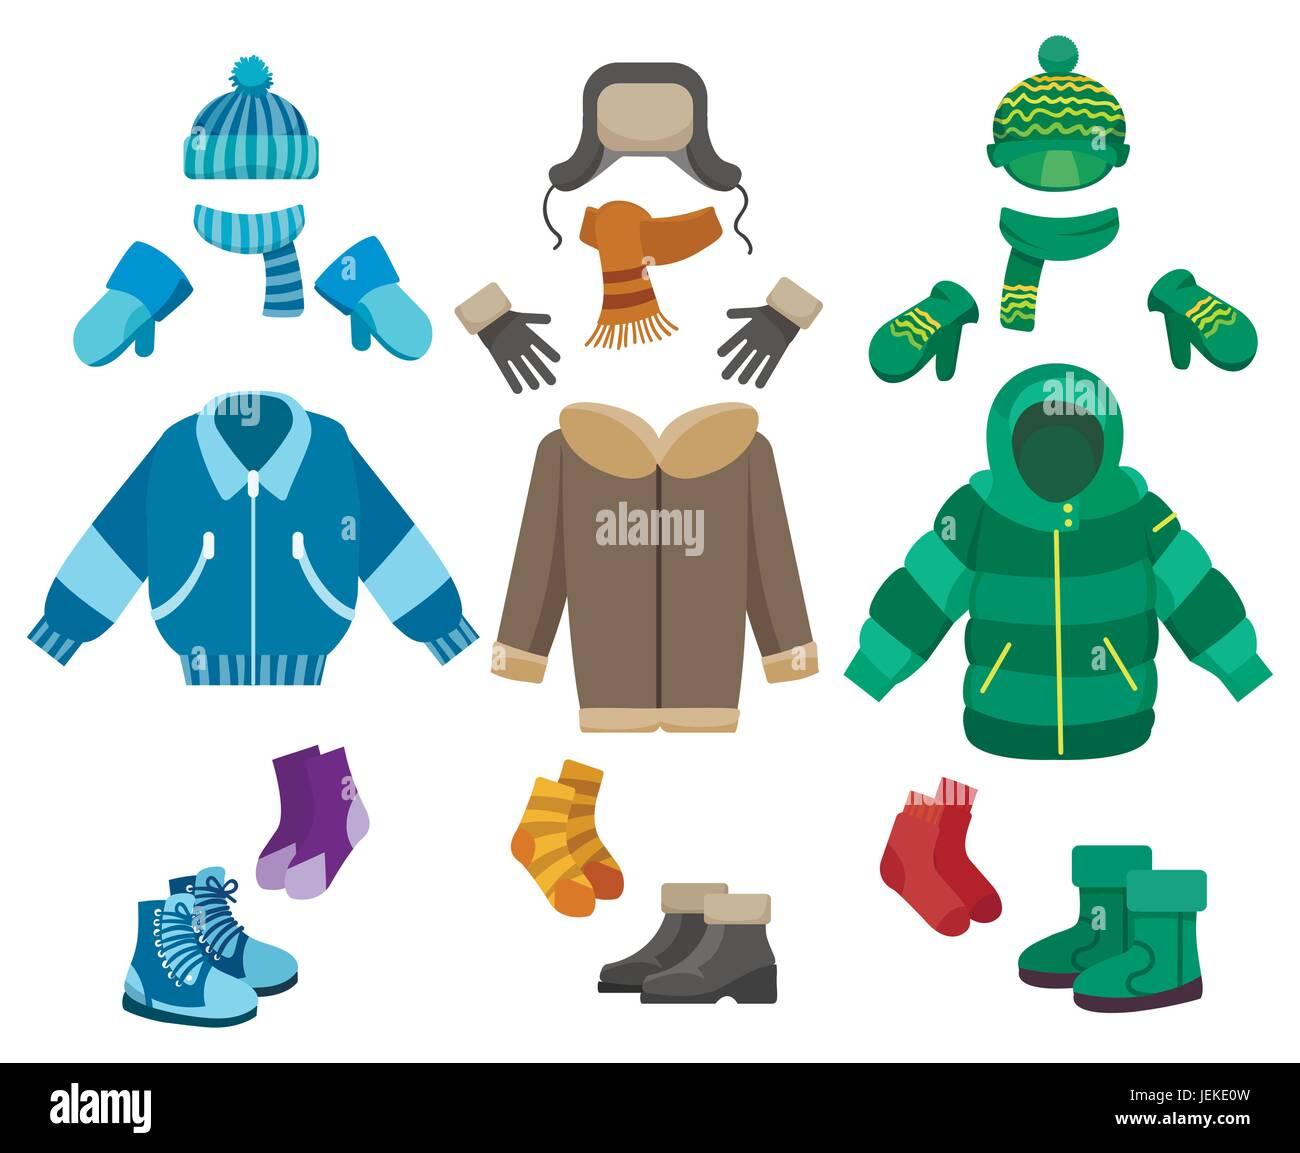 a559e0b4bb Ropa de invierno macho aislado sobre fondo blanco. Clima frío colección de  ropa para niños